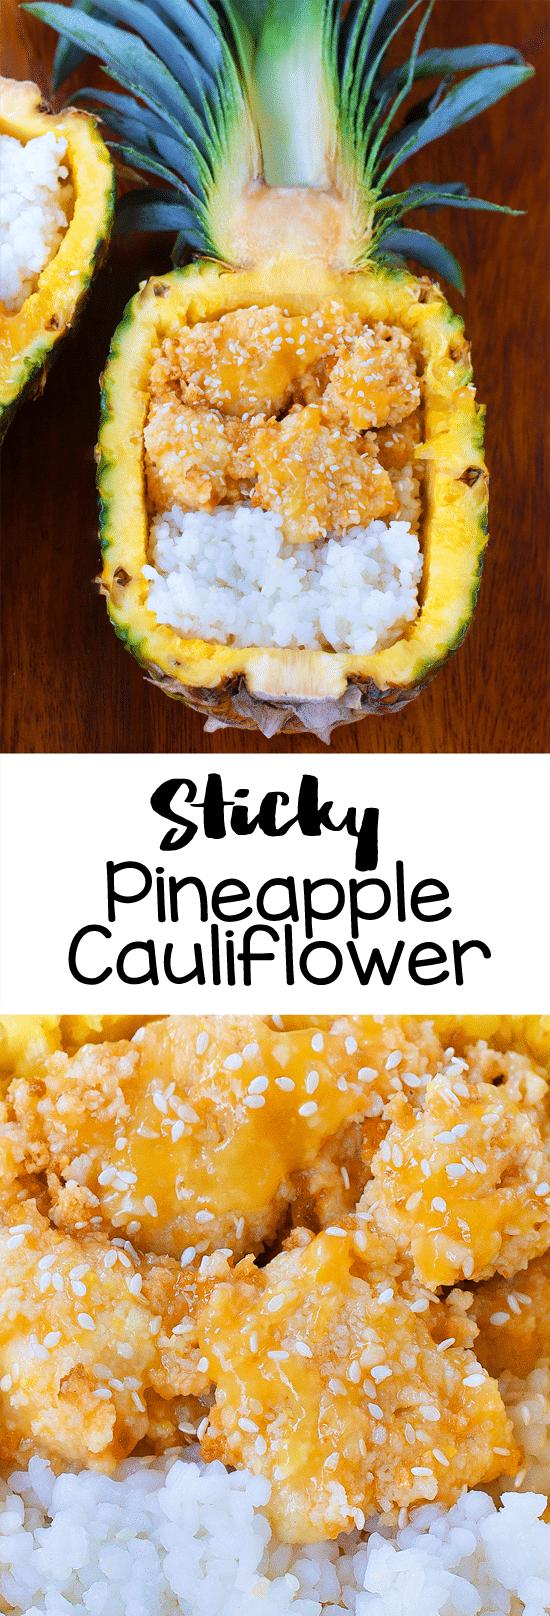 Secretly Healthy Sticky Pineapple Cauliflower Recipe (Vegan, Easy)